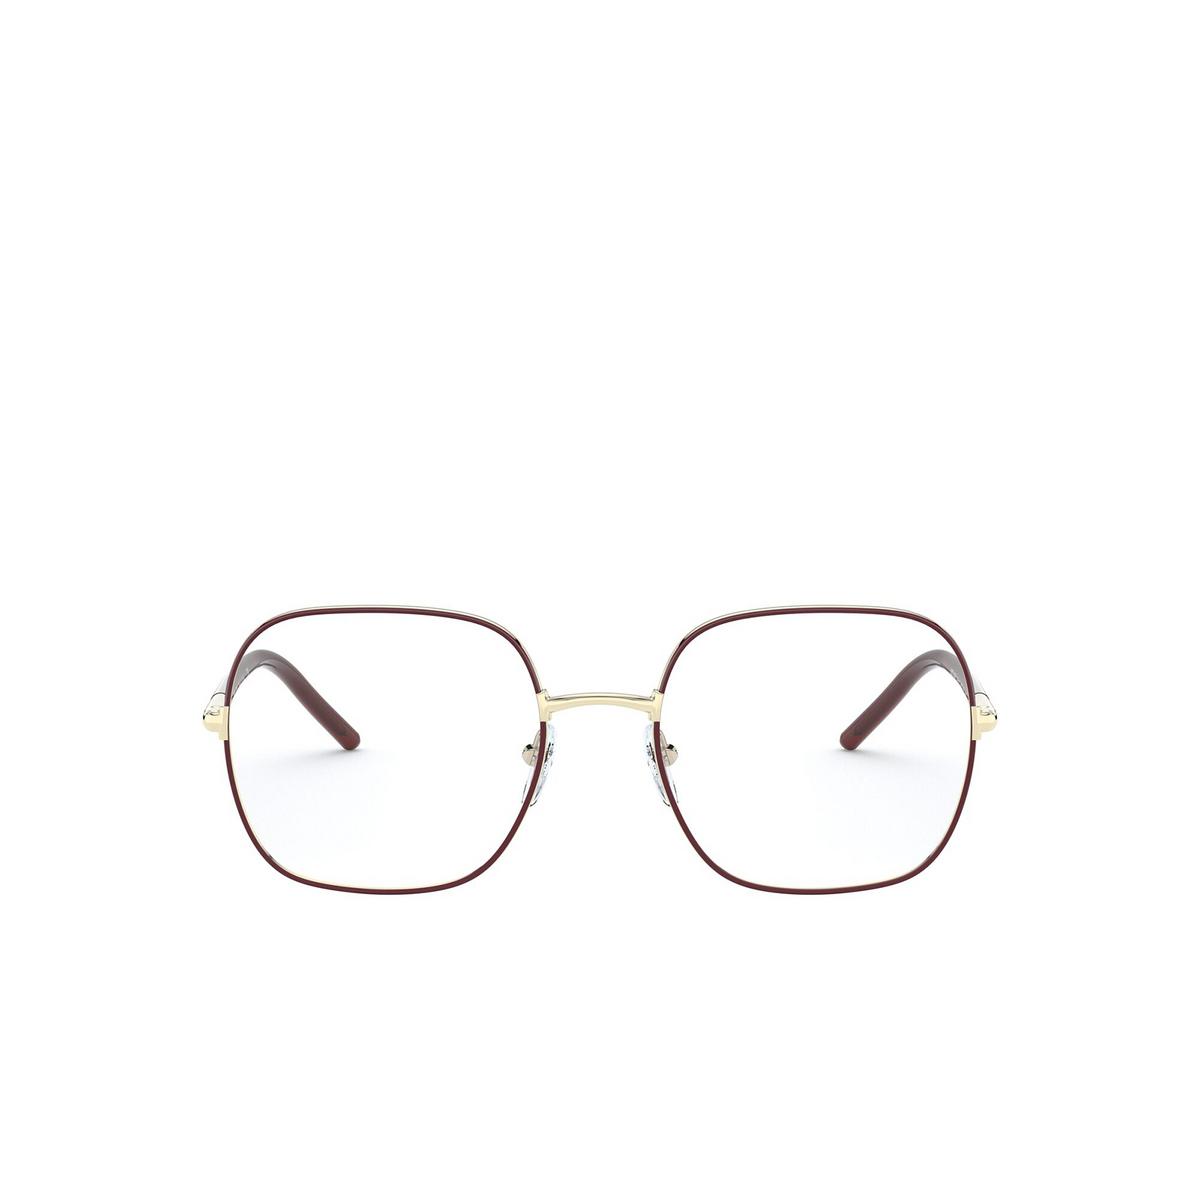 Prada® Rectangle Eyeglasses: PR 56WV color Bordeaux 09B1O1 - front view.